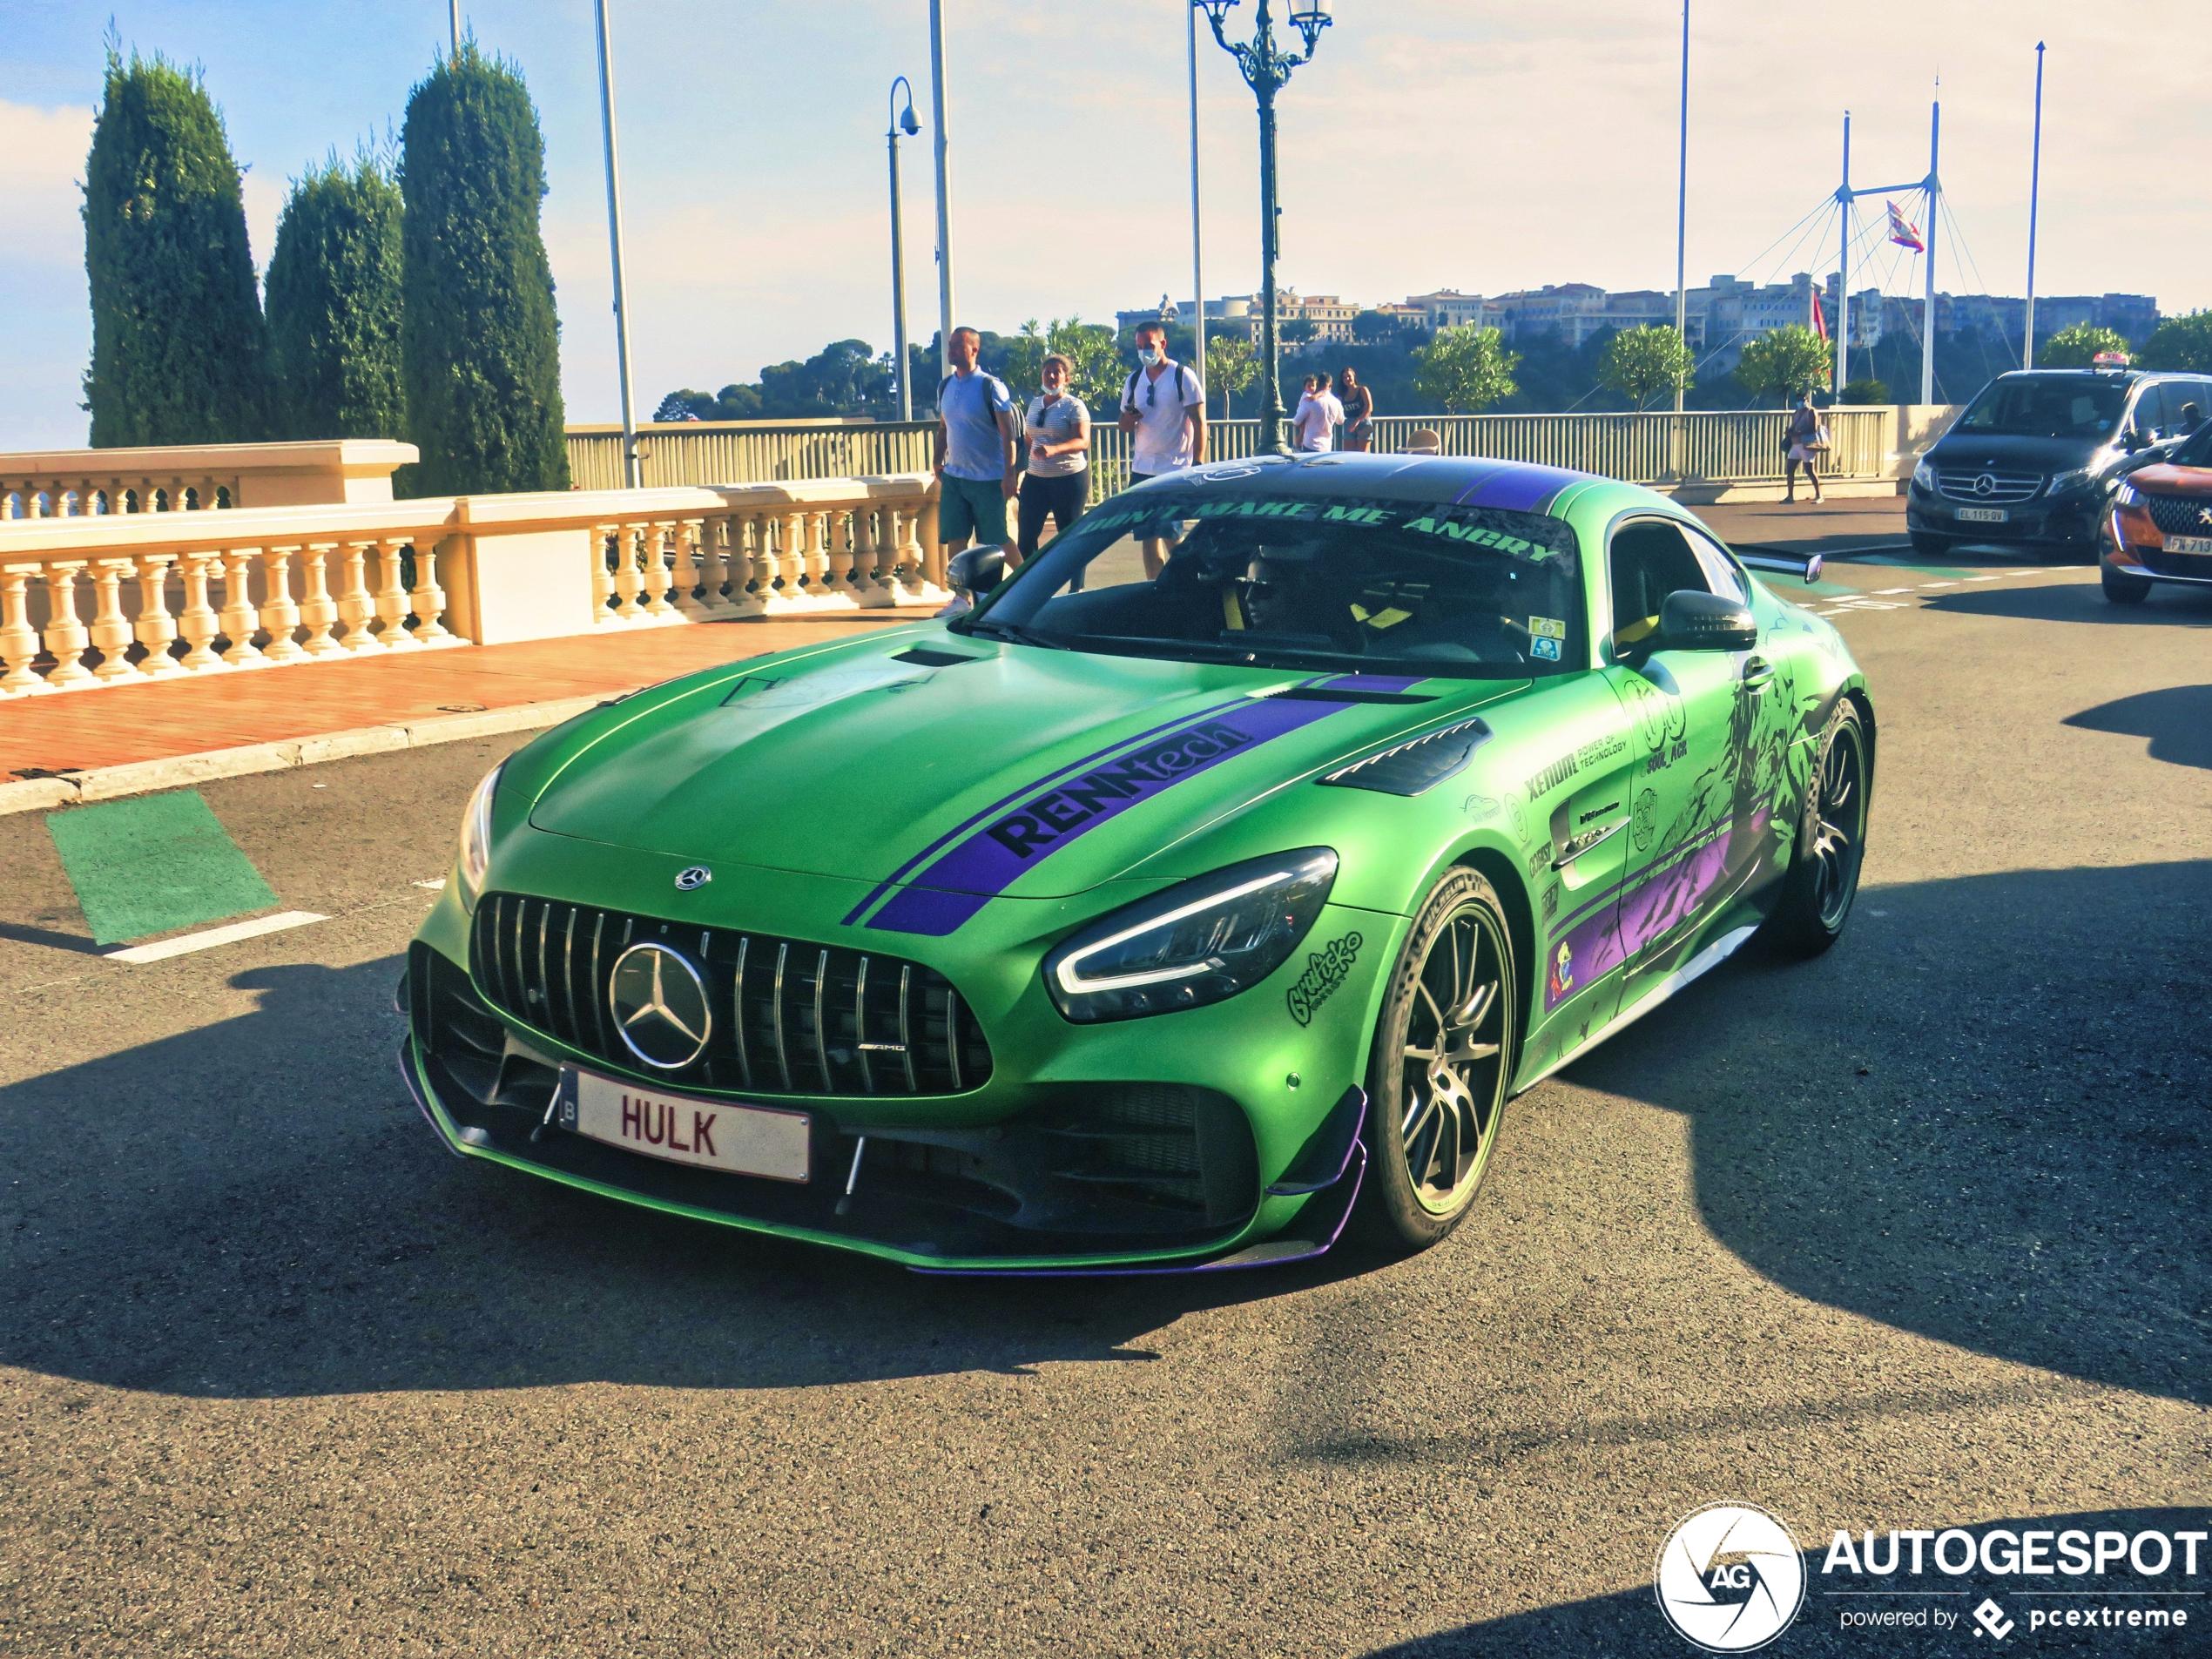 Mercedes-AMG Renntech GT R Pro C190